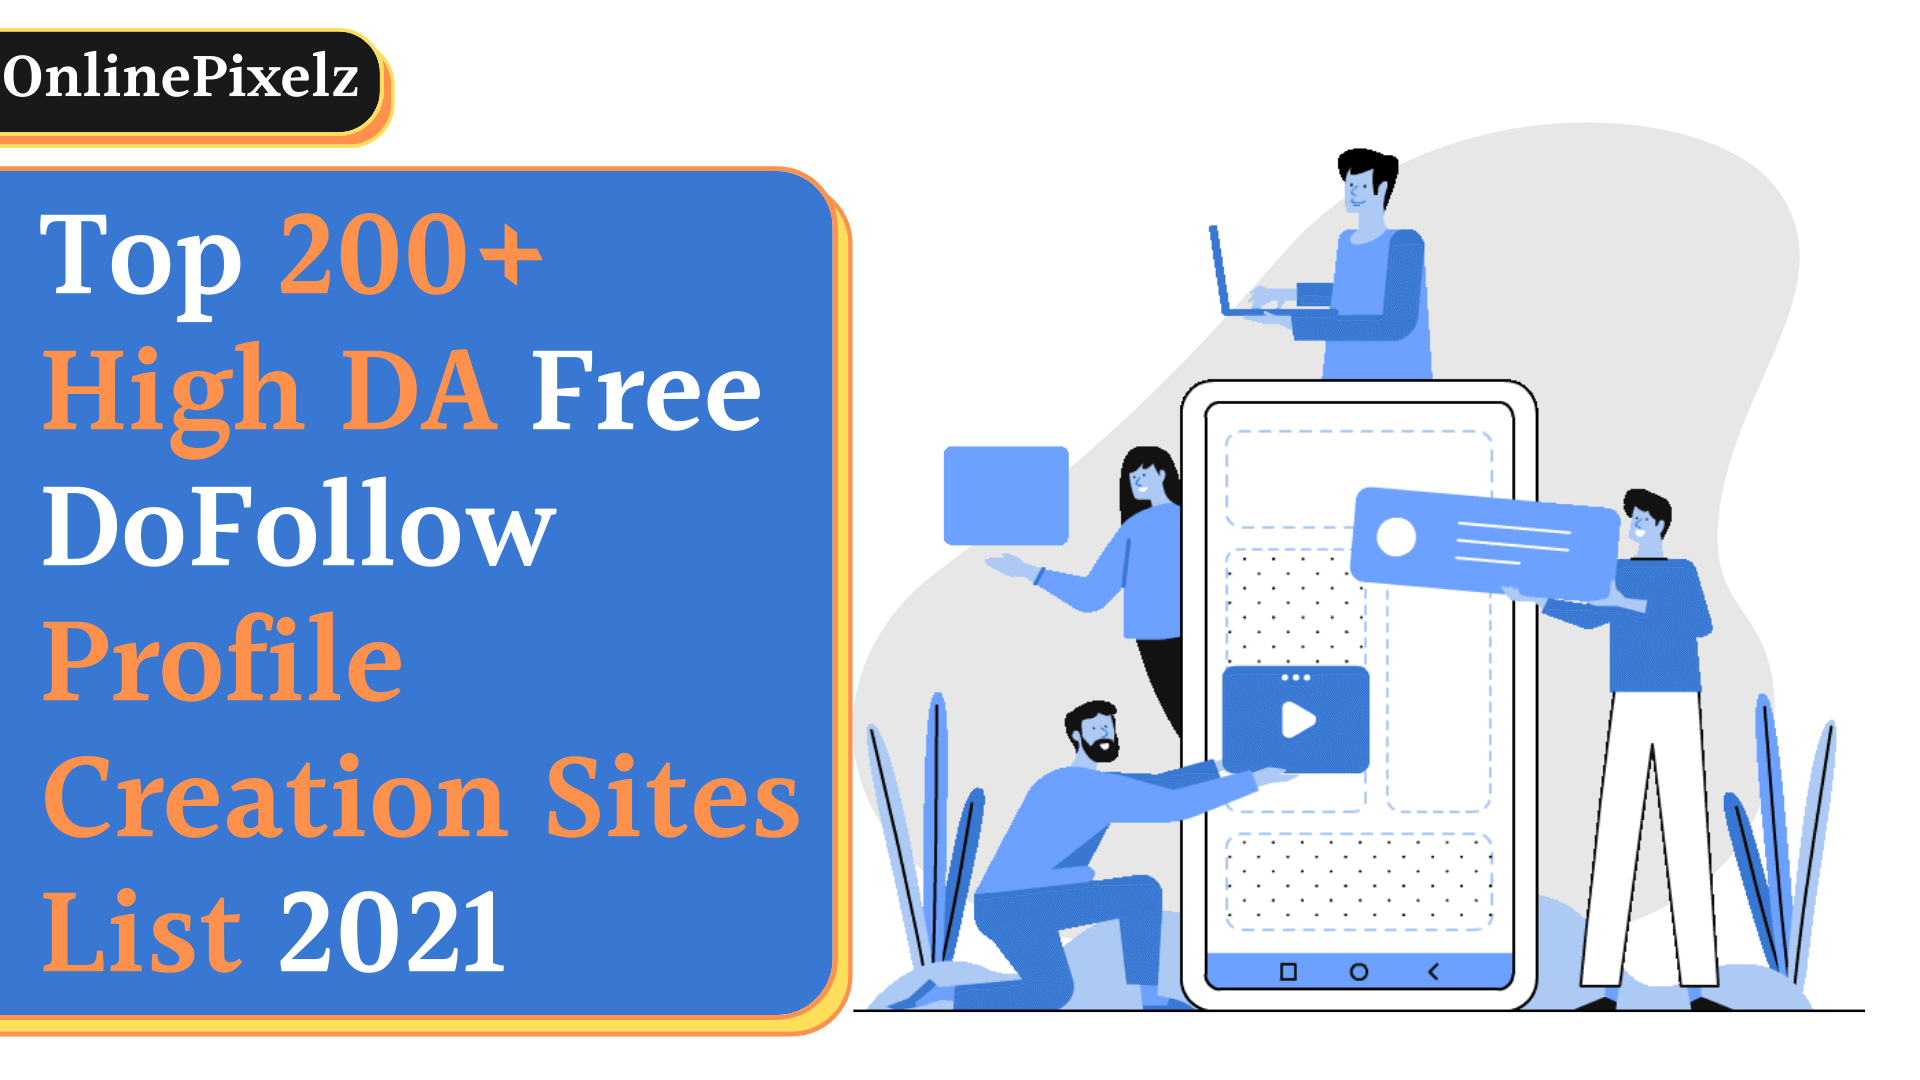 Top 200+ High DA PA Free Do Follow Profile Creation Sites List 2021